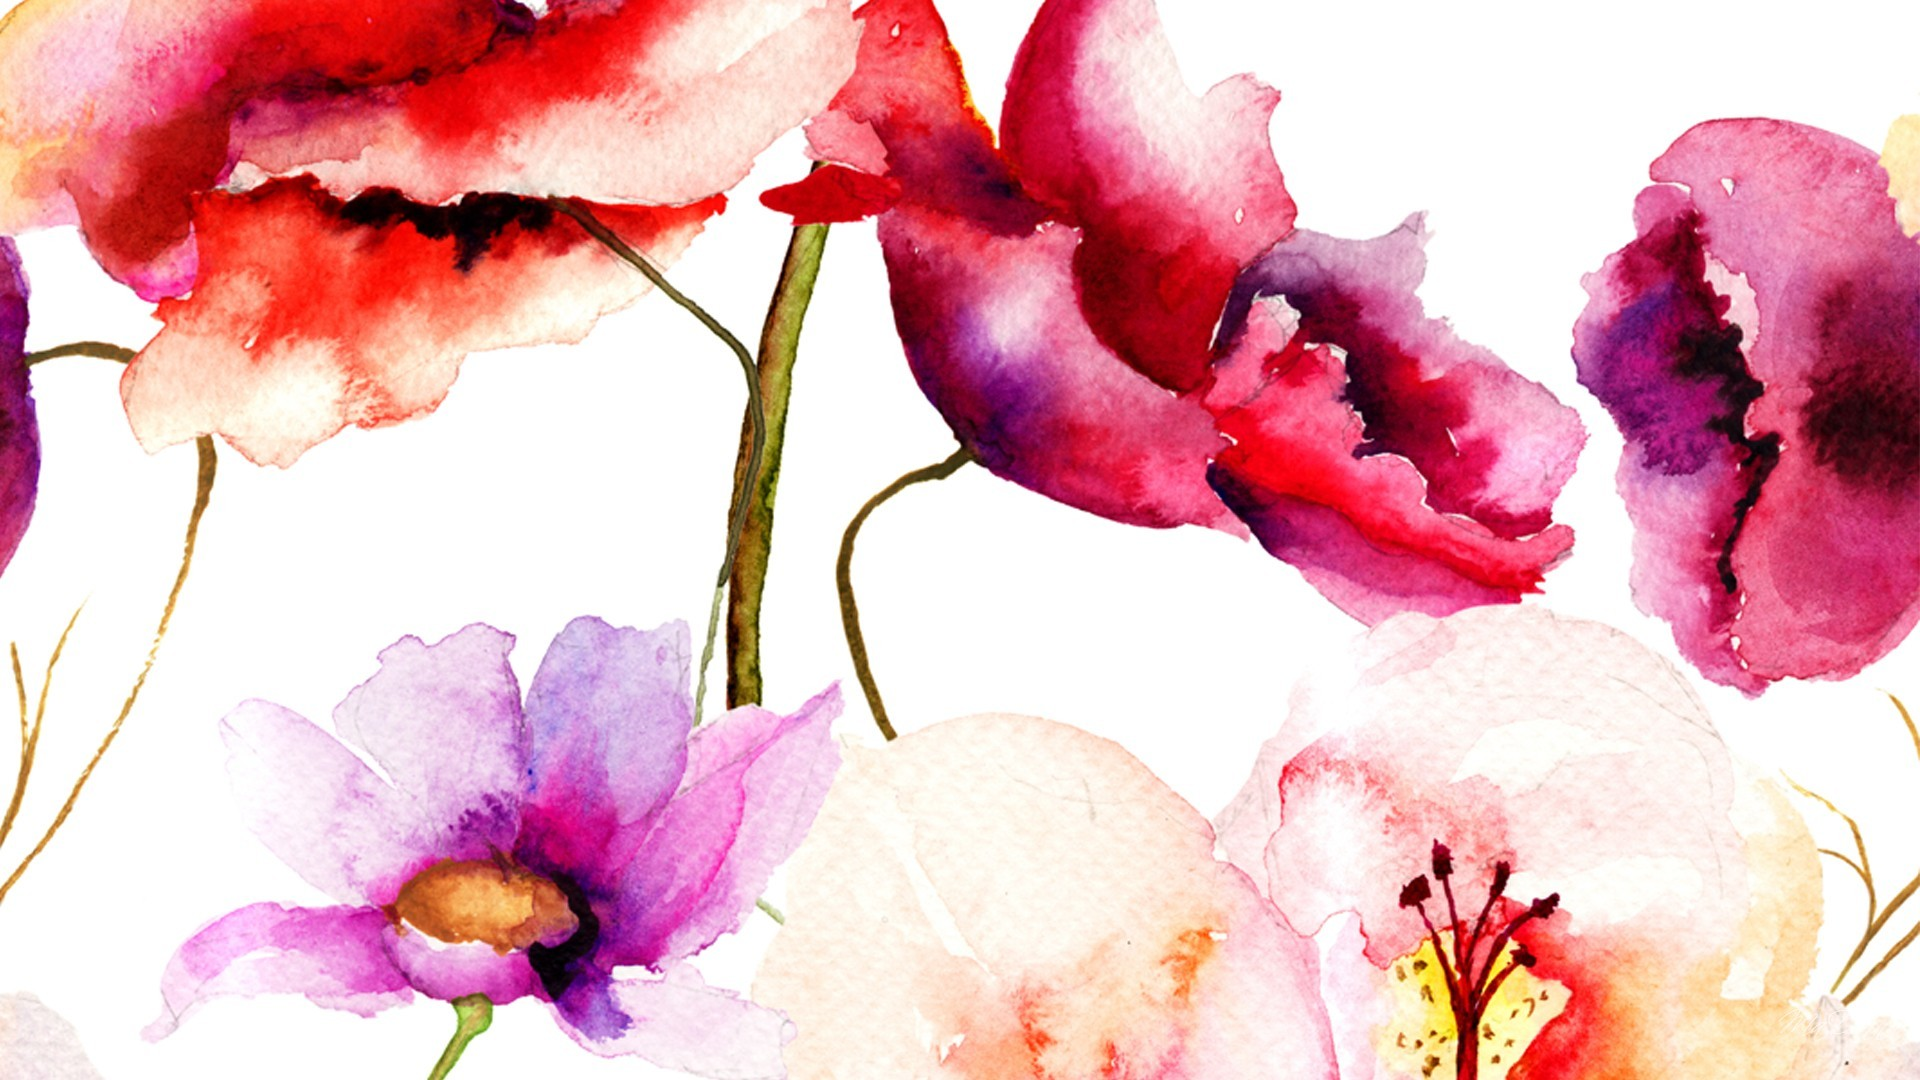 Watercolor Wallpaper Viewing Gallery 1920x1080PX ~ Watercolor .